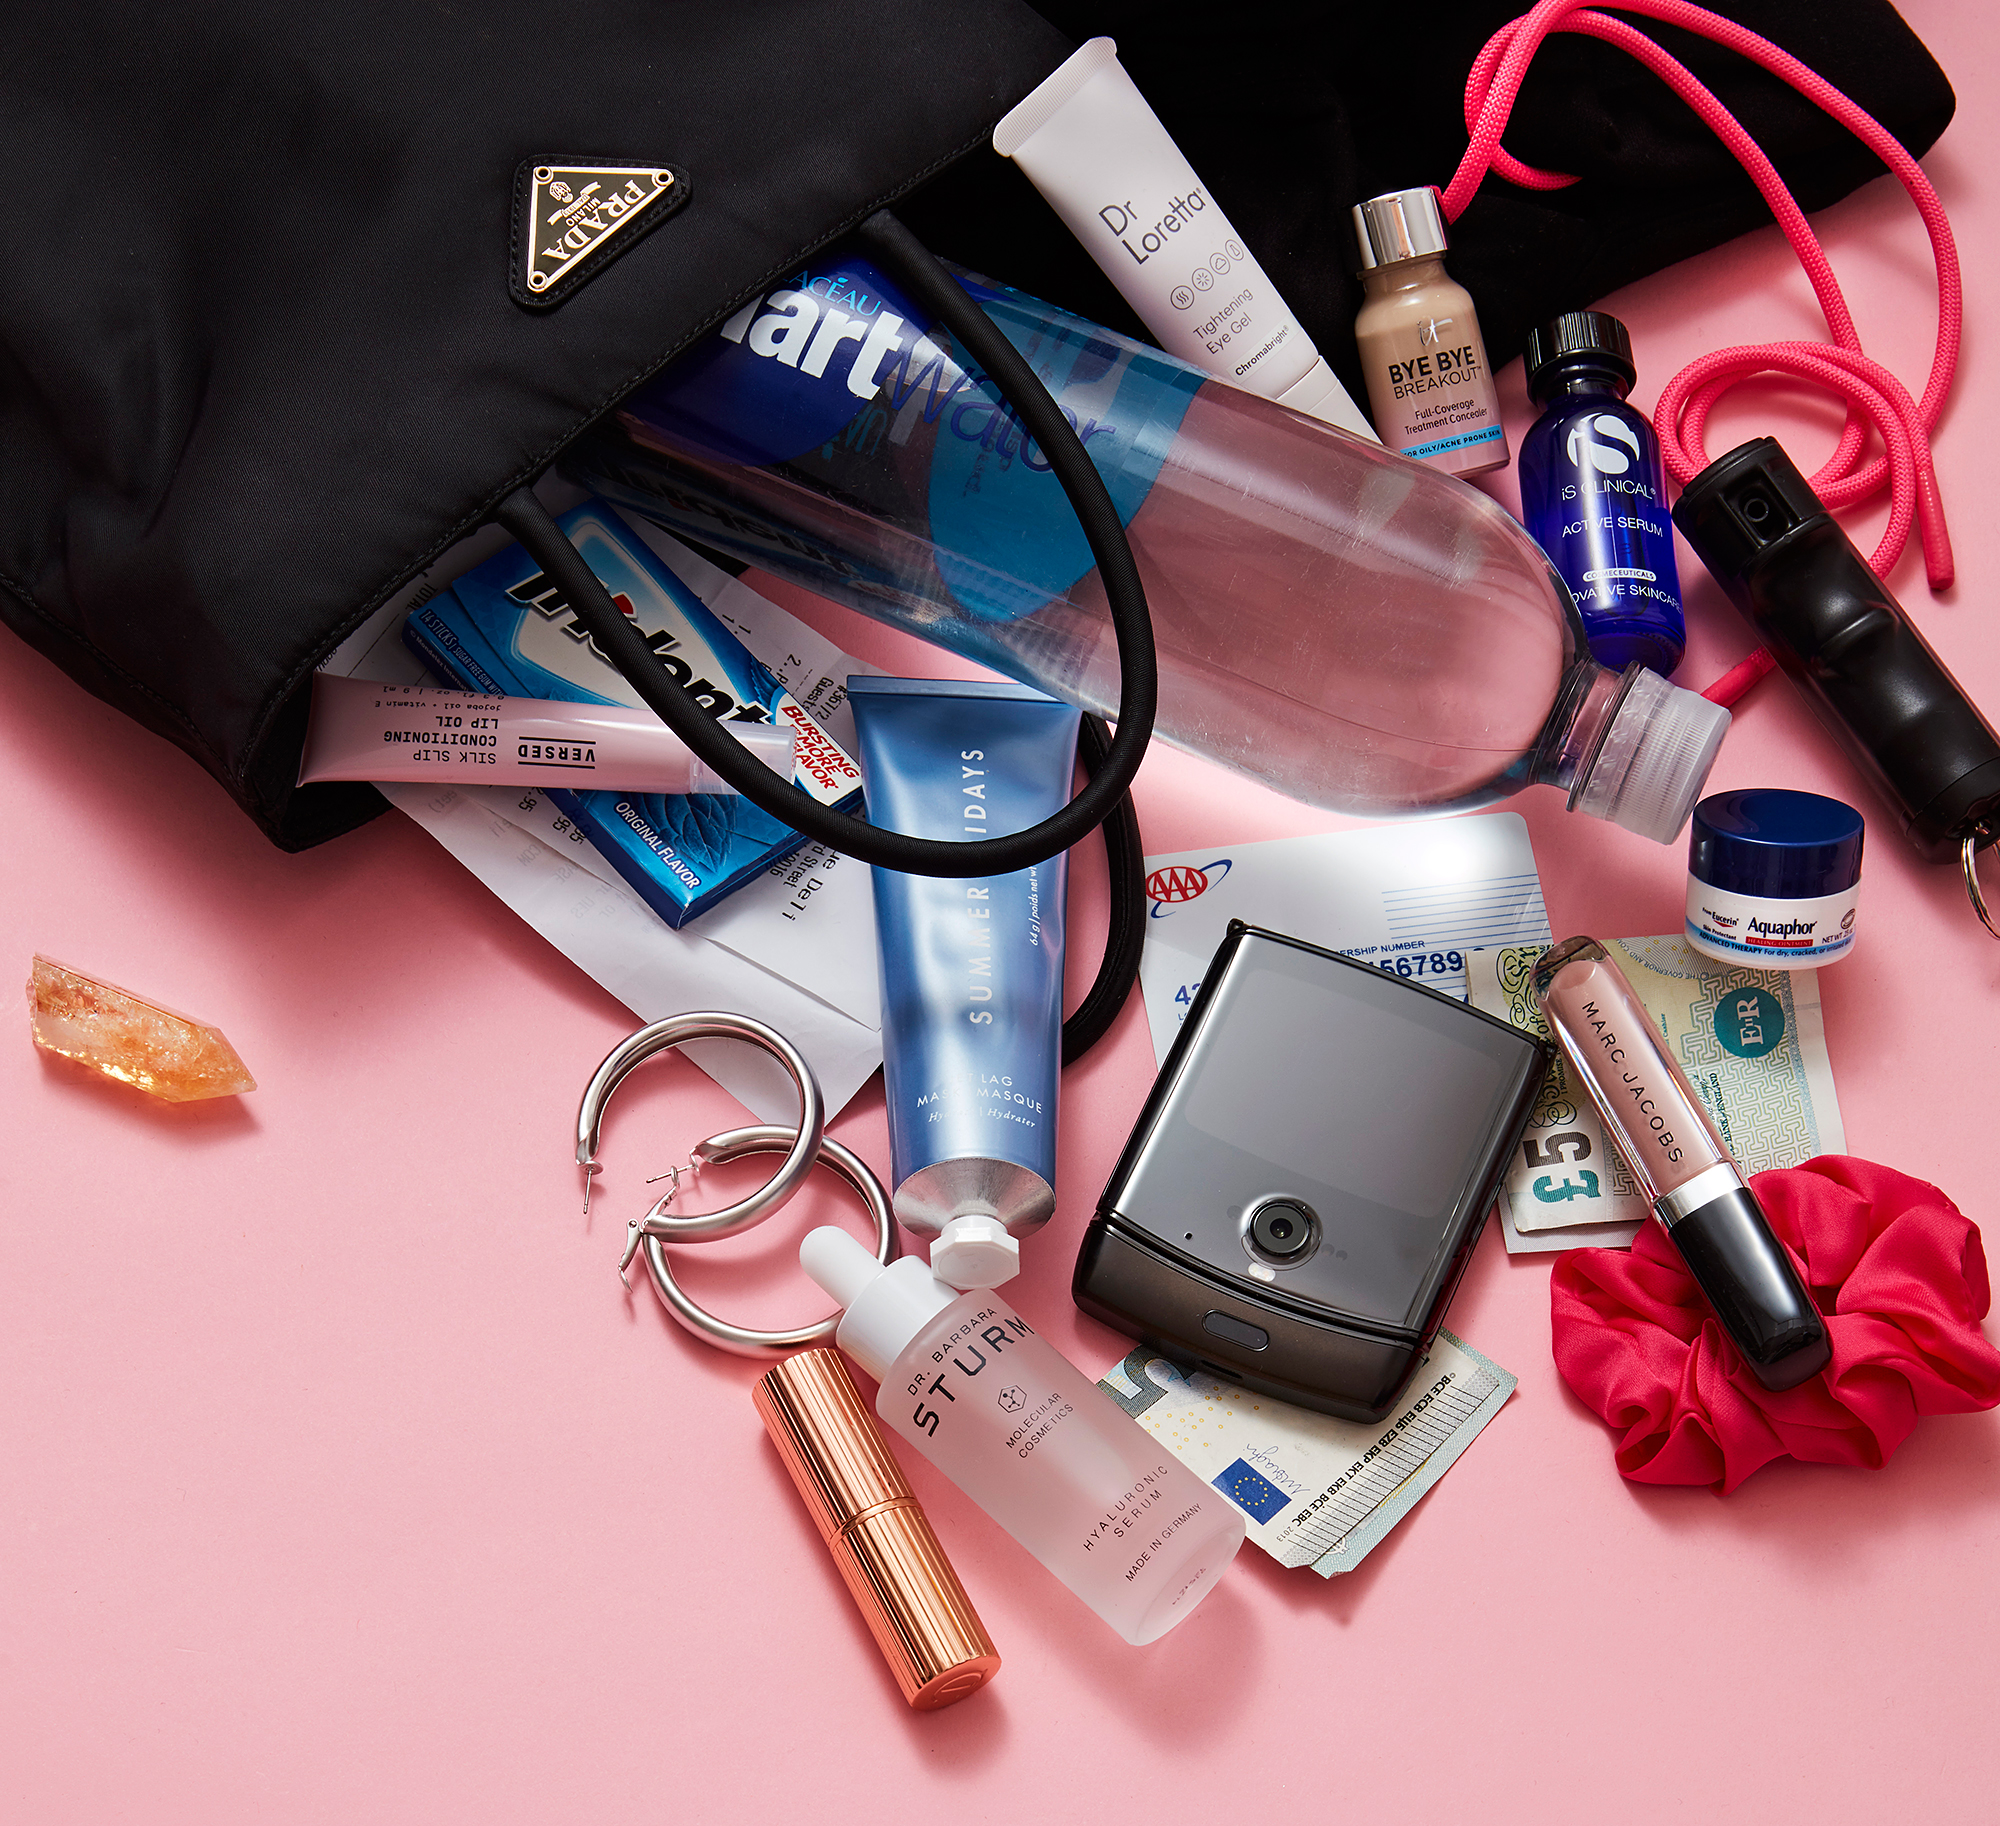 Delilah Belle Hamlin: What's in My Bag?